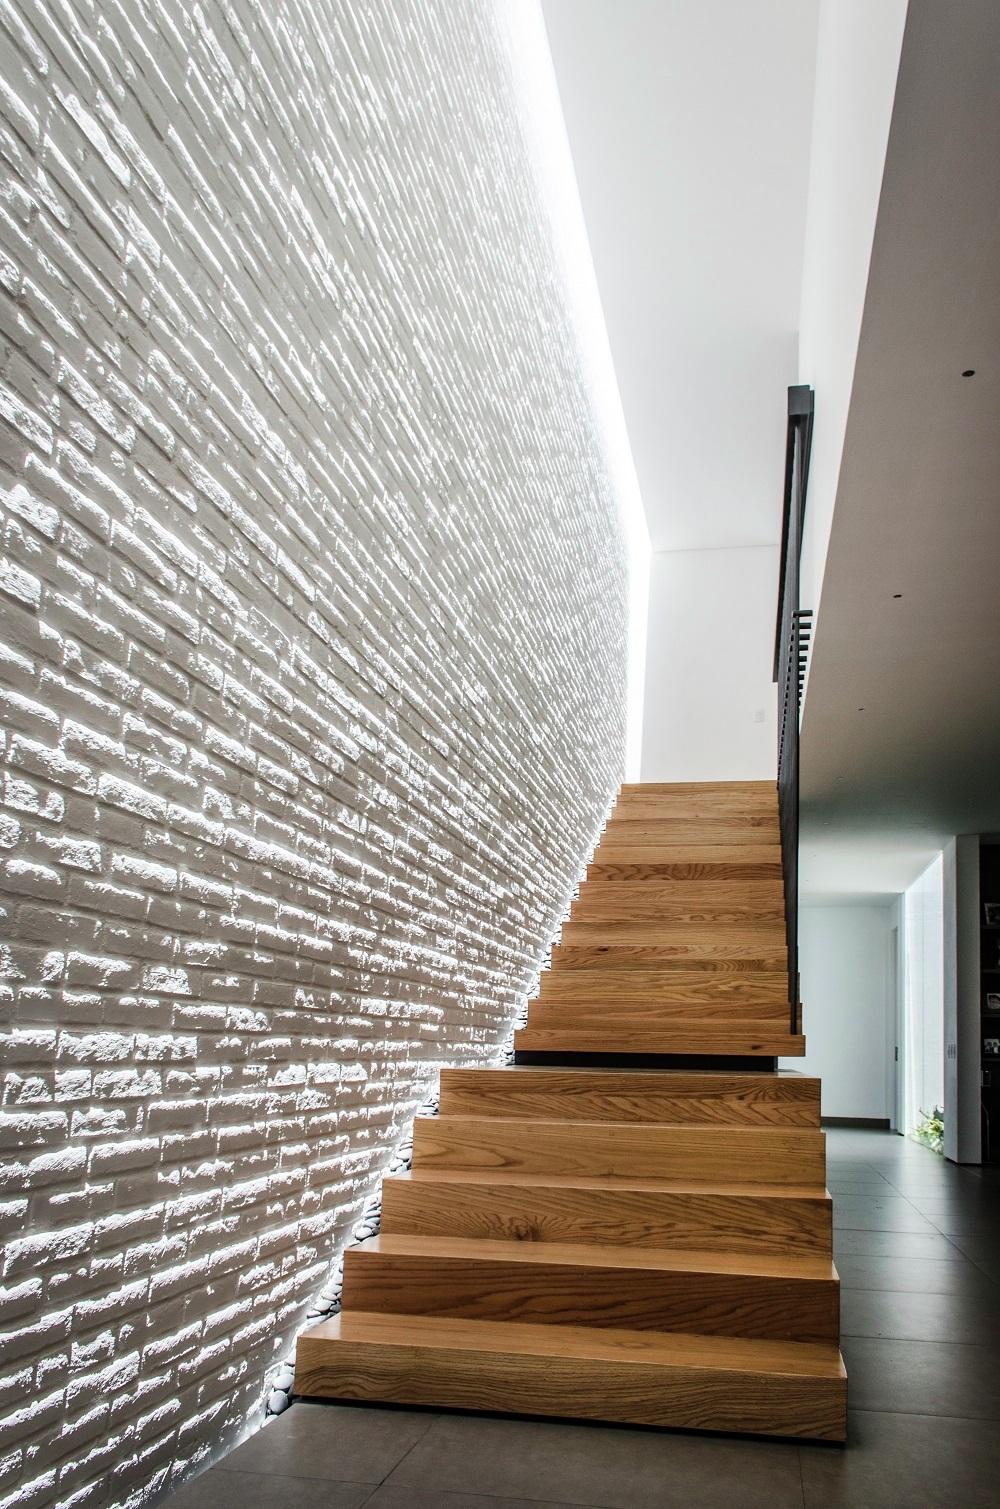 Galer a de casa b g adi arquitectura y dise o interior 8 for Arquitectura y diseno interior